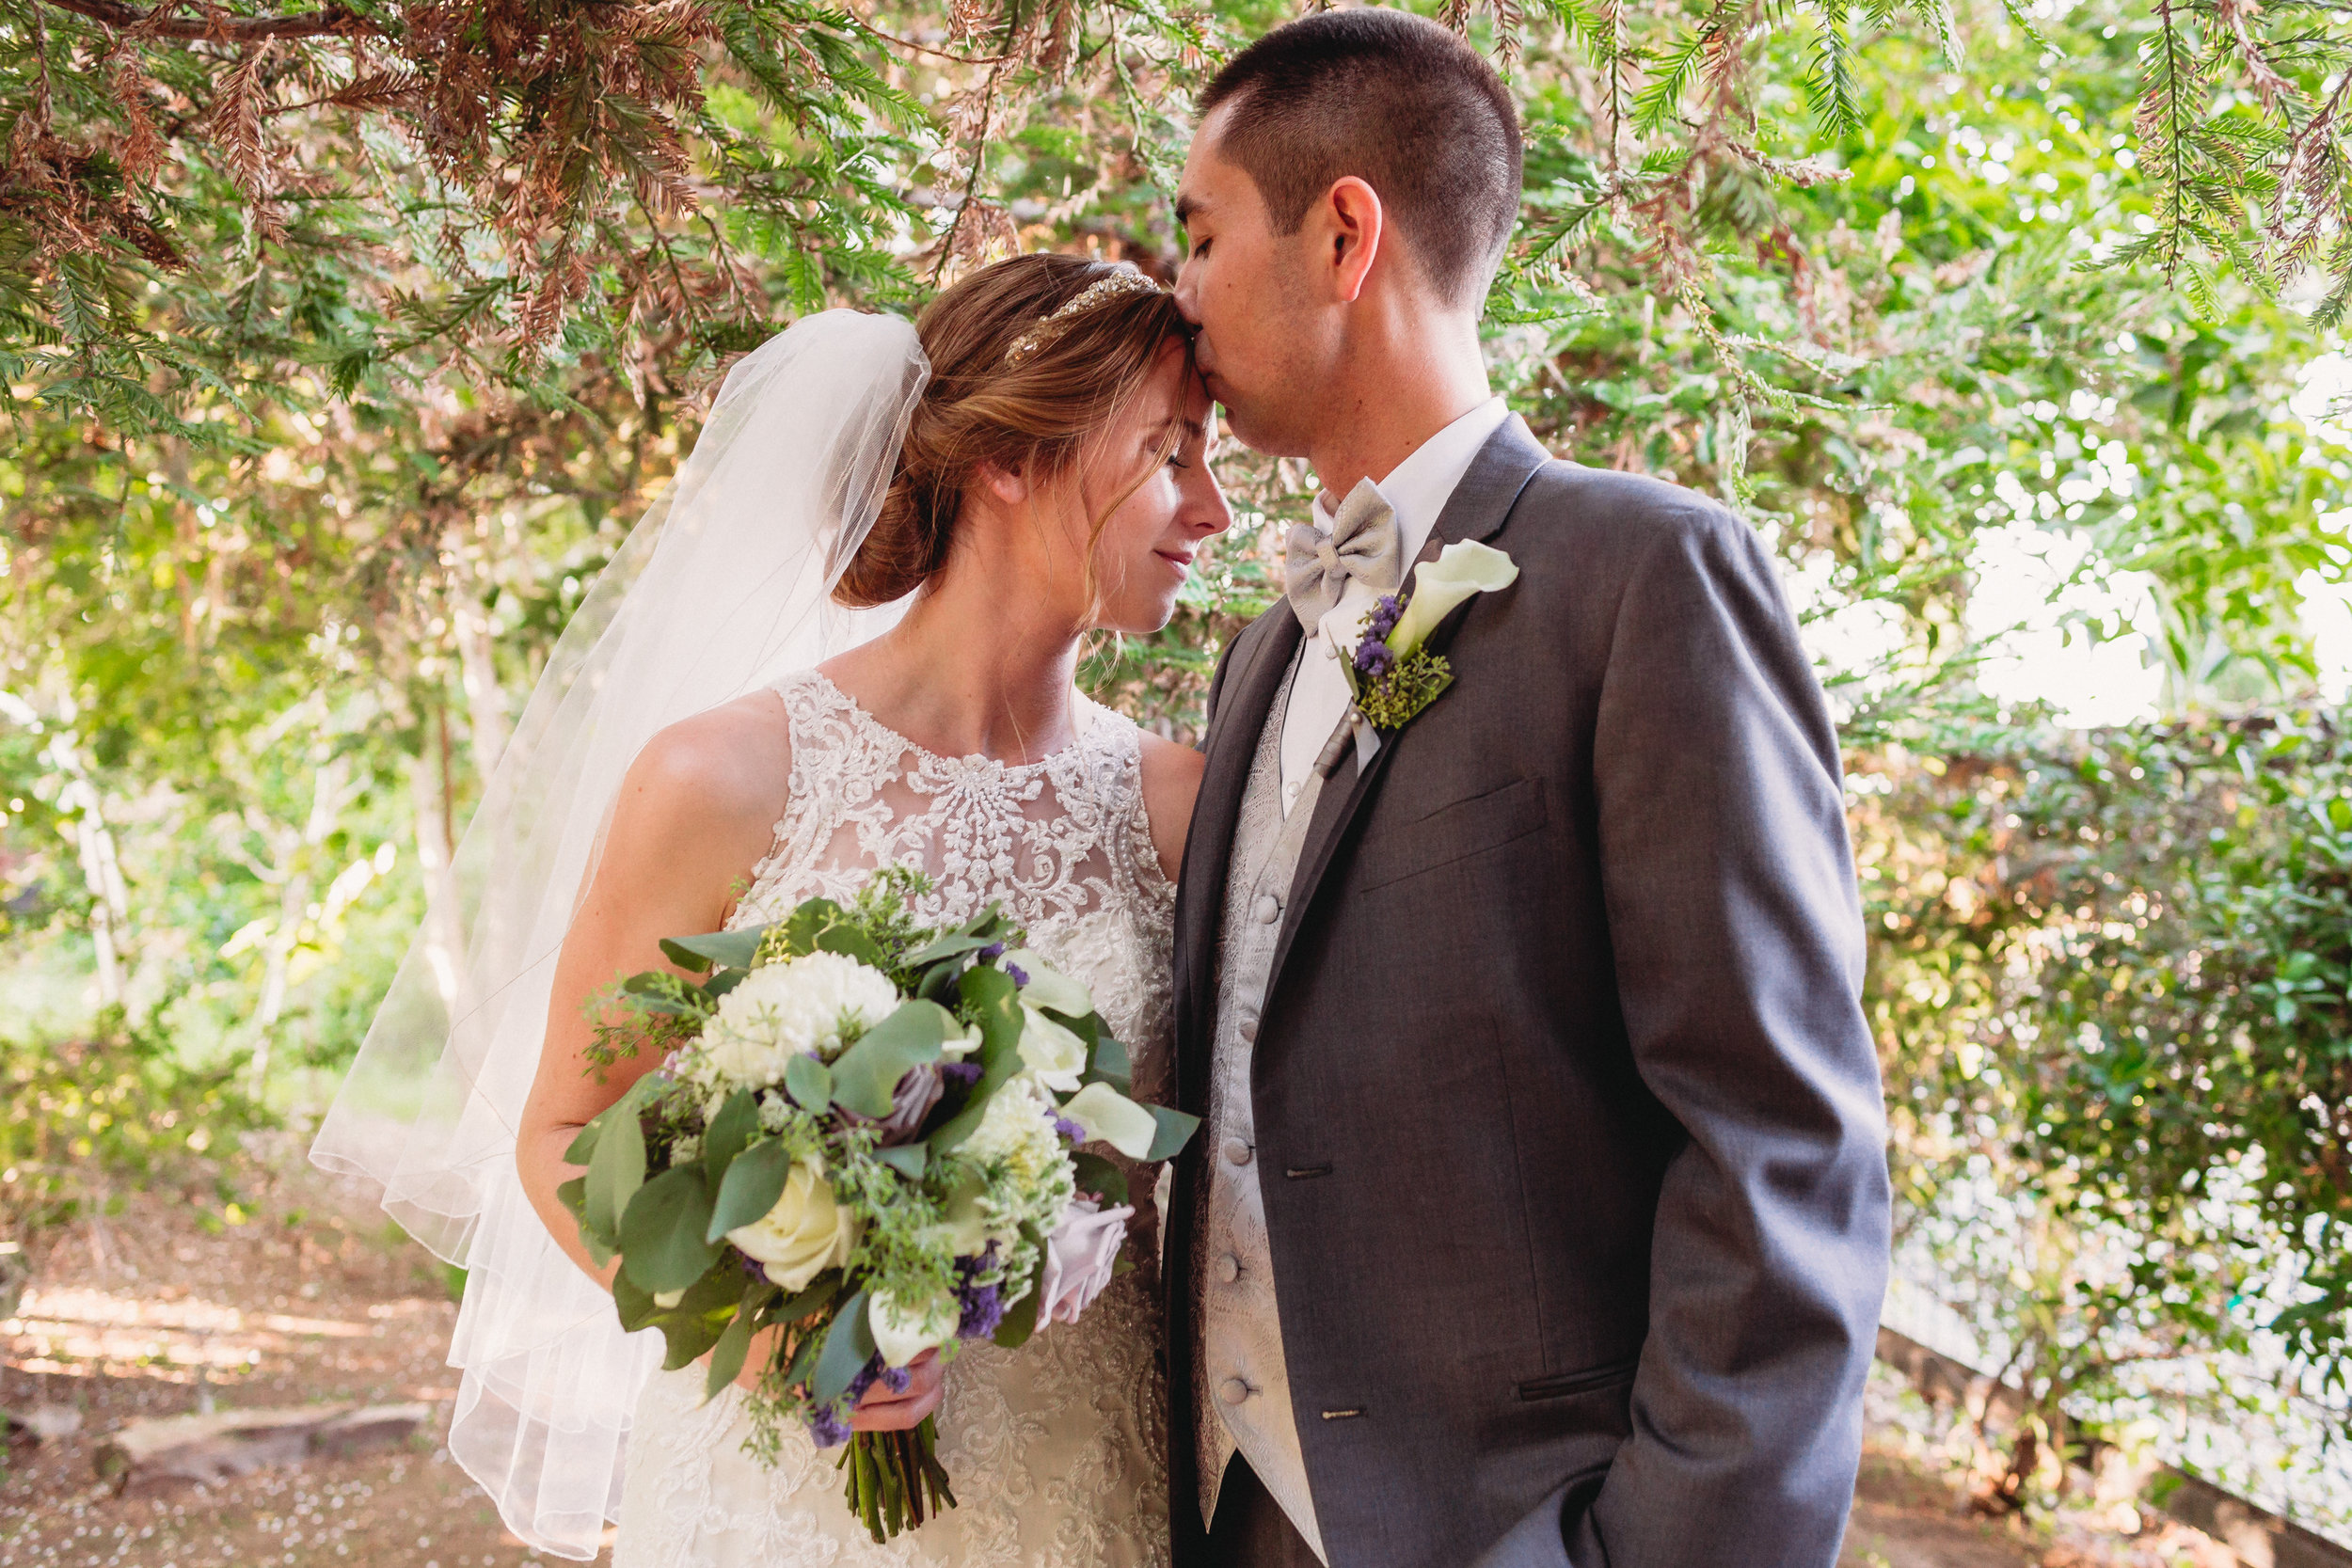 rebeccaylasotras-bay-area-garden-wedding-53.jpg